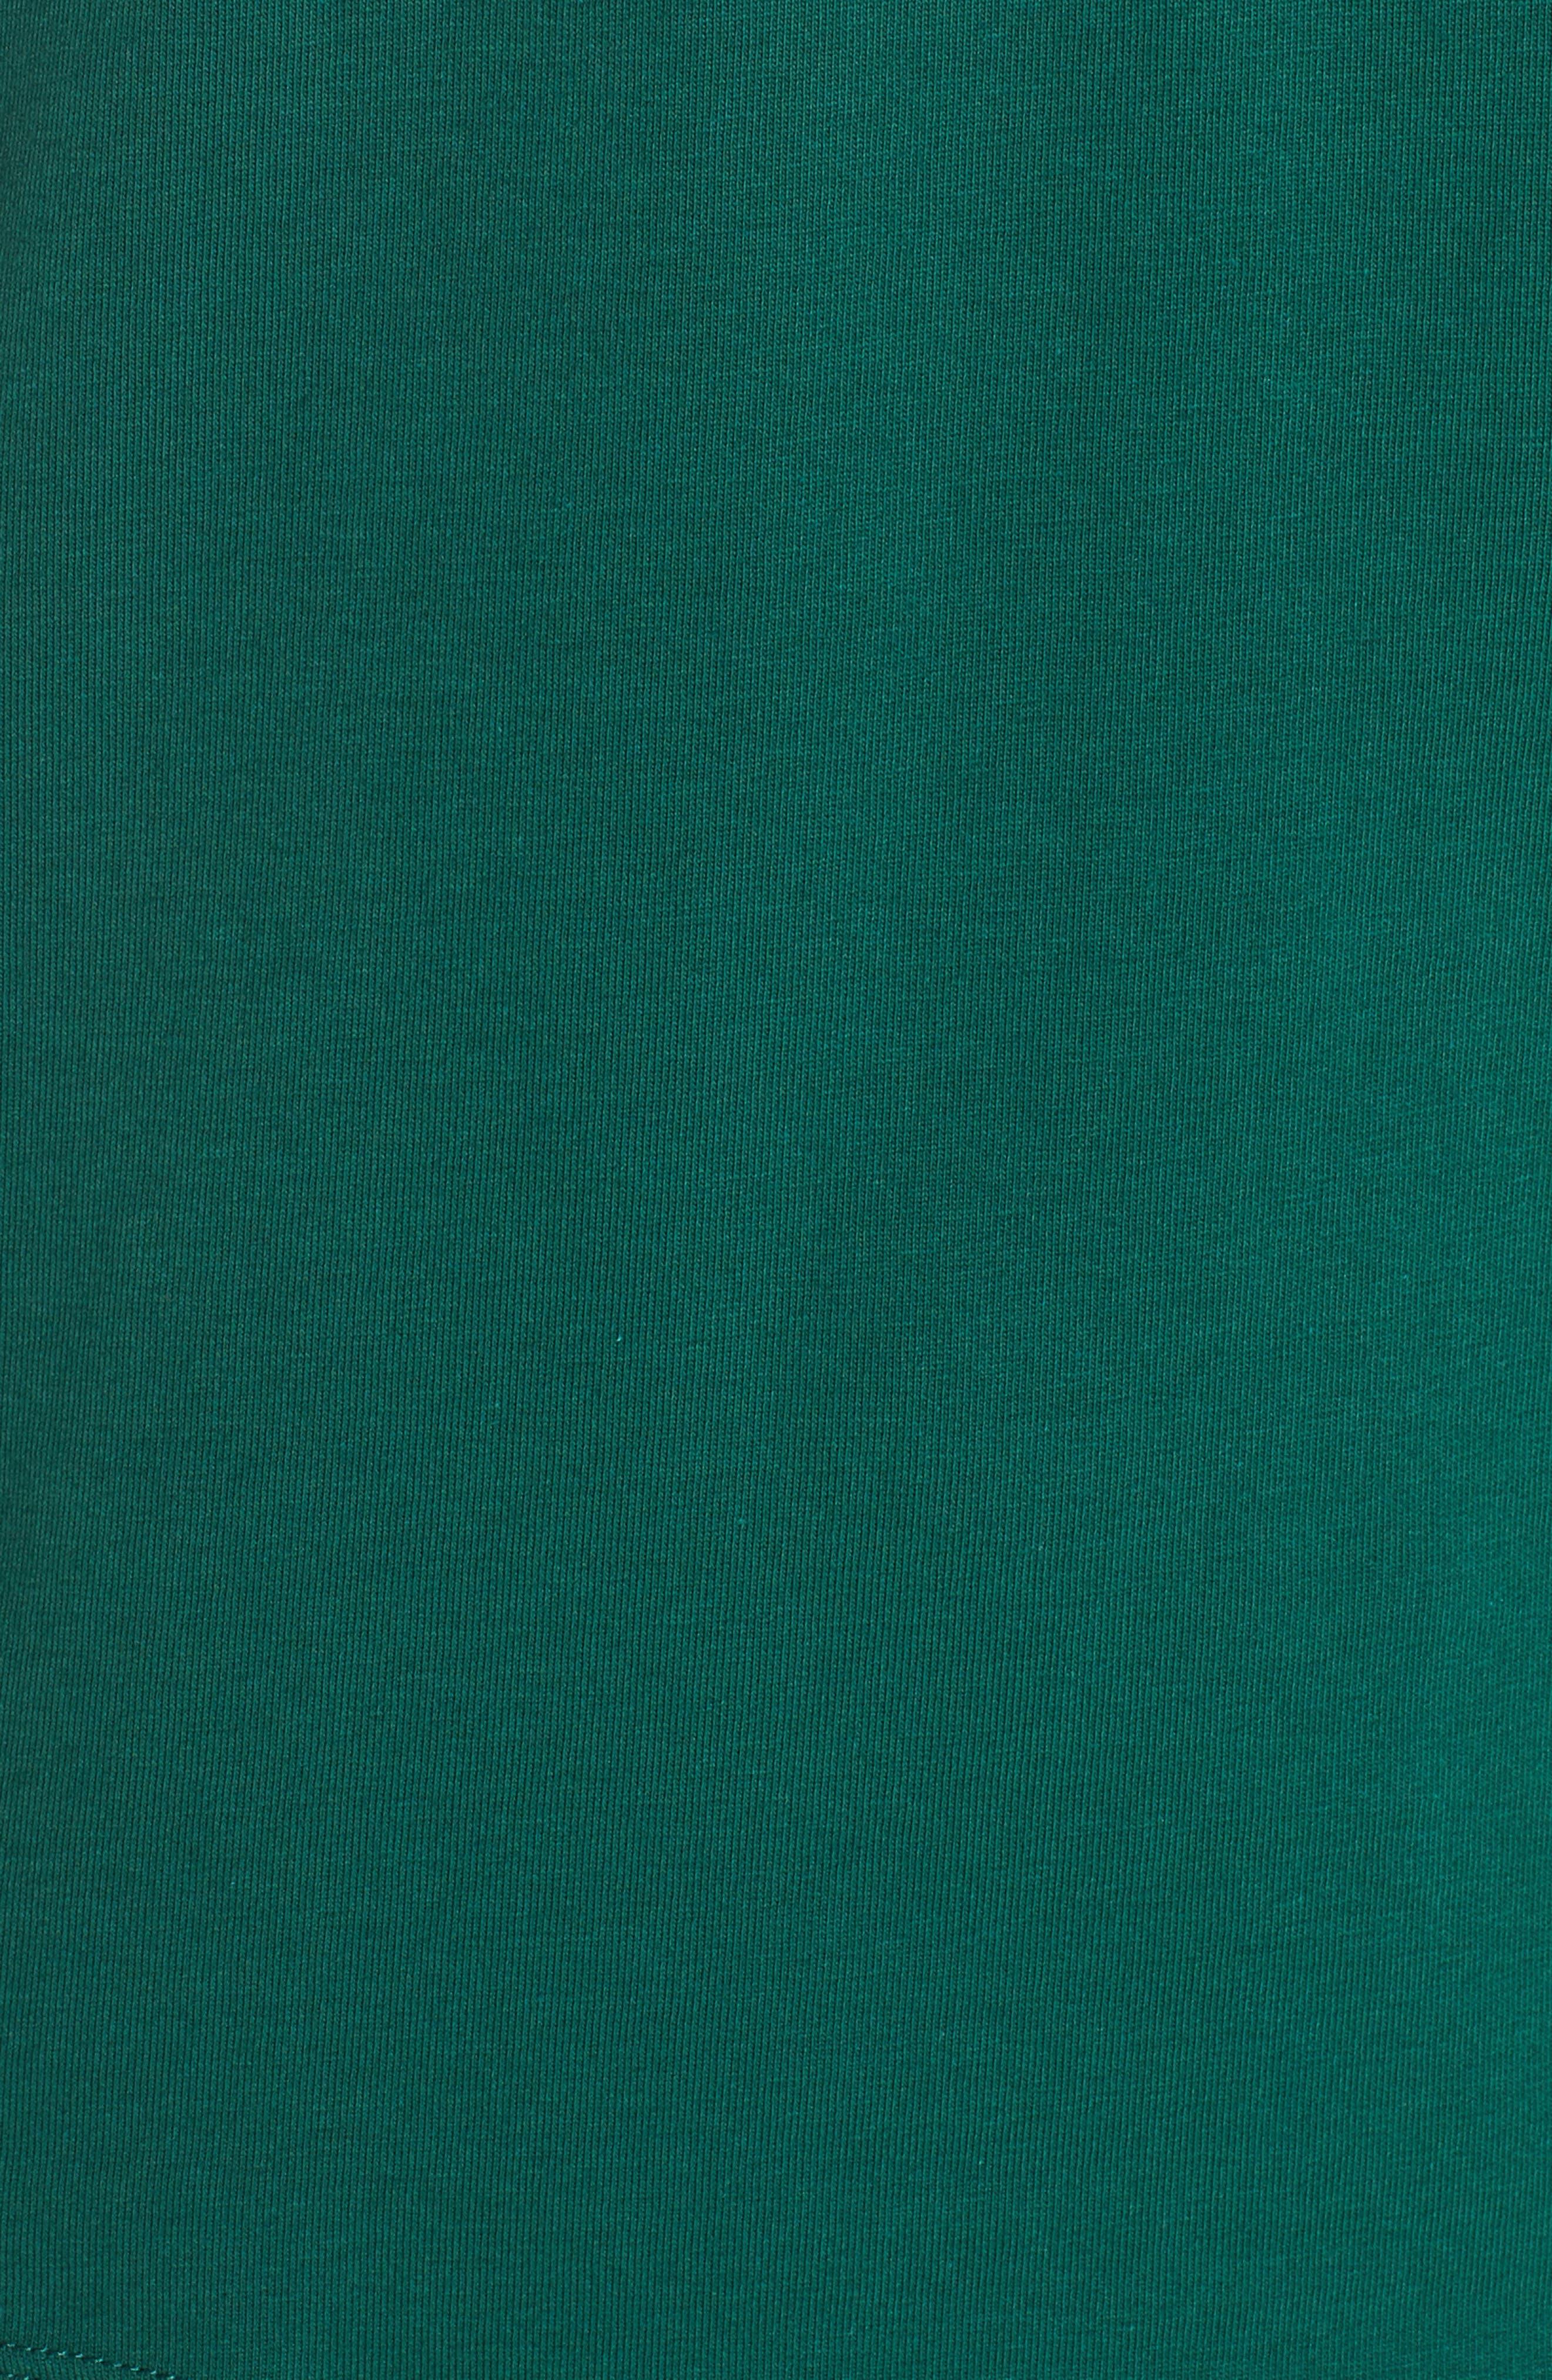 adidas Trefoil Tee,                             Alternate thumbnail 6, color,                             COLLEGIATE GREEN